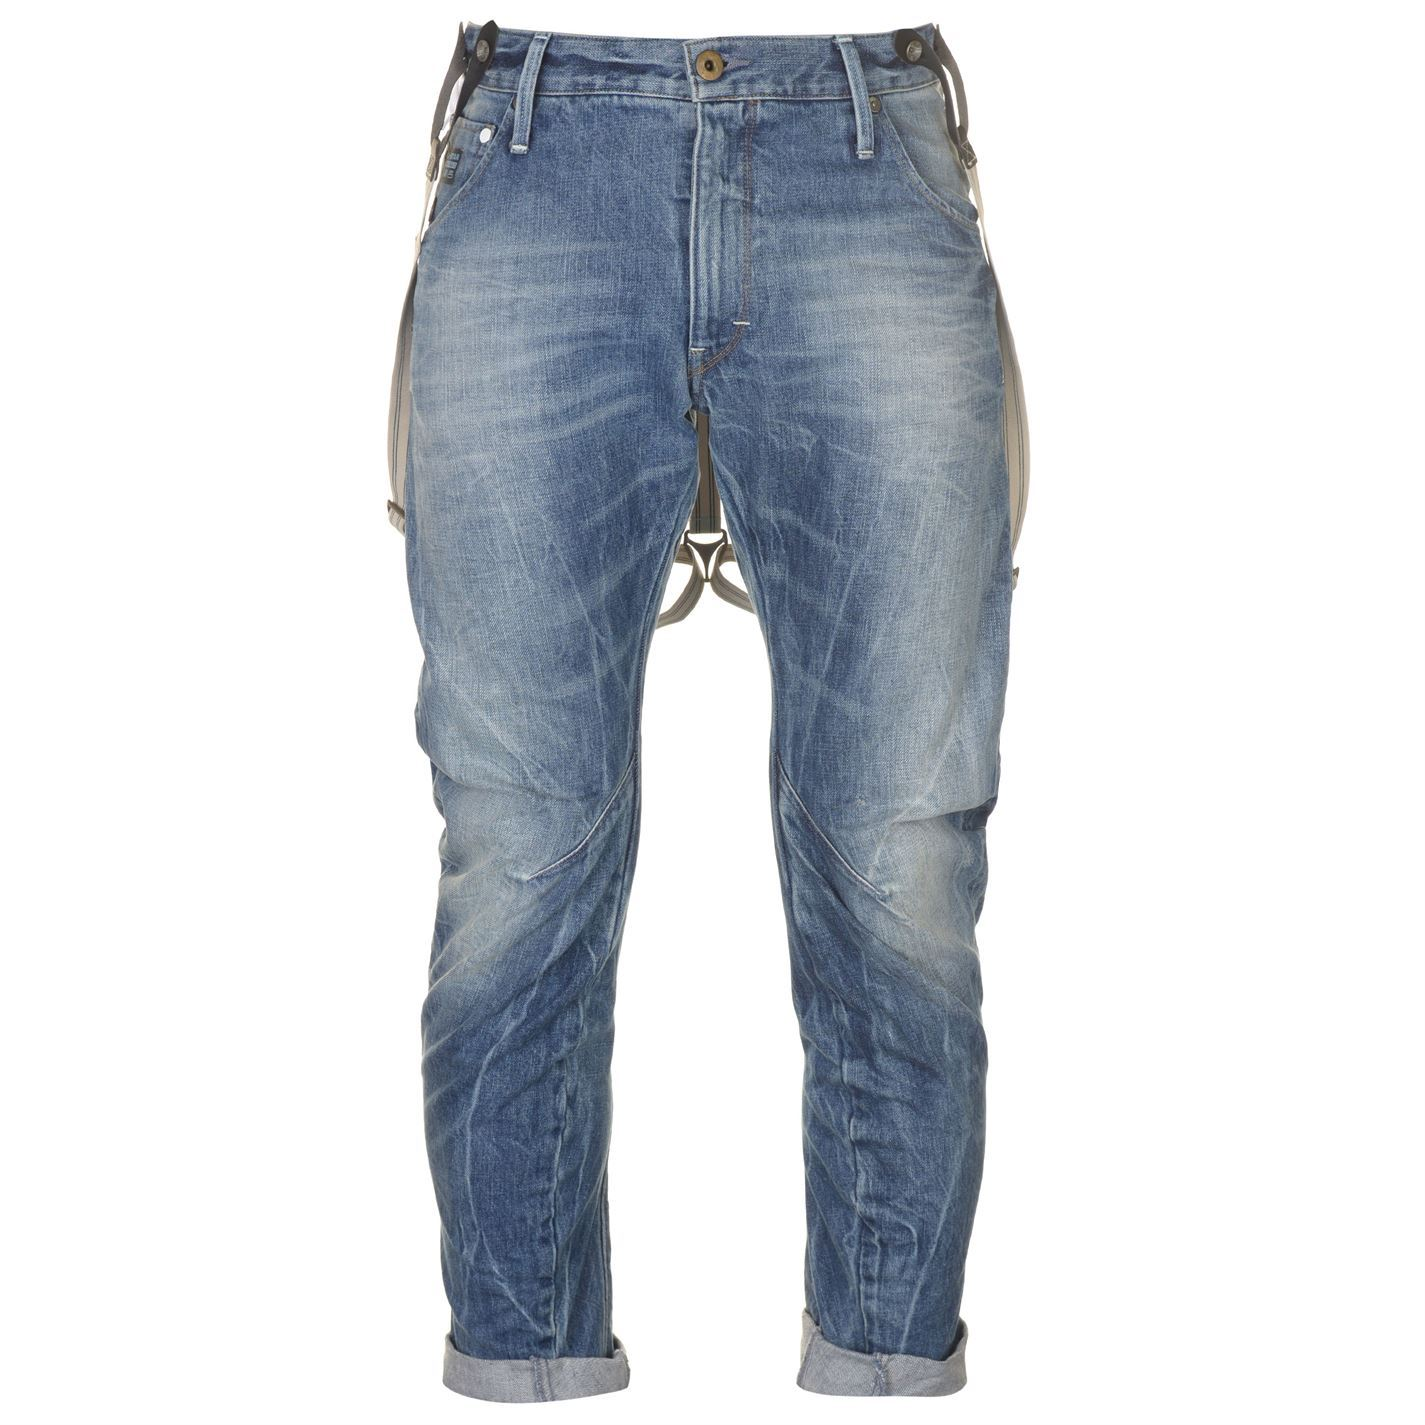 G-Star Raw Jeans Arc 3d Loose Tapered Braces Oligo Denim W30 L34   eBay 77da0faa53